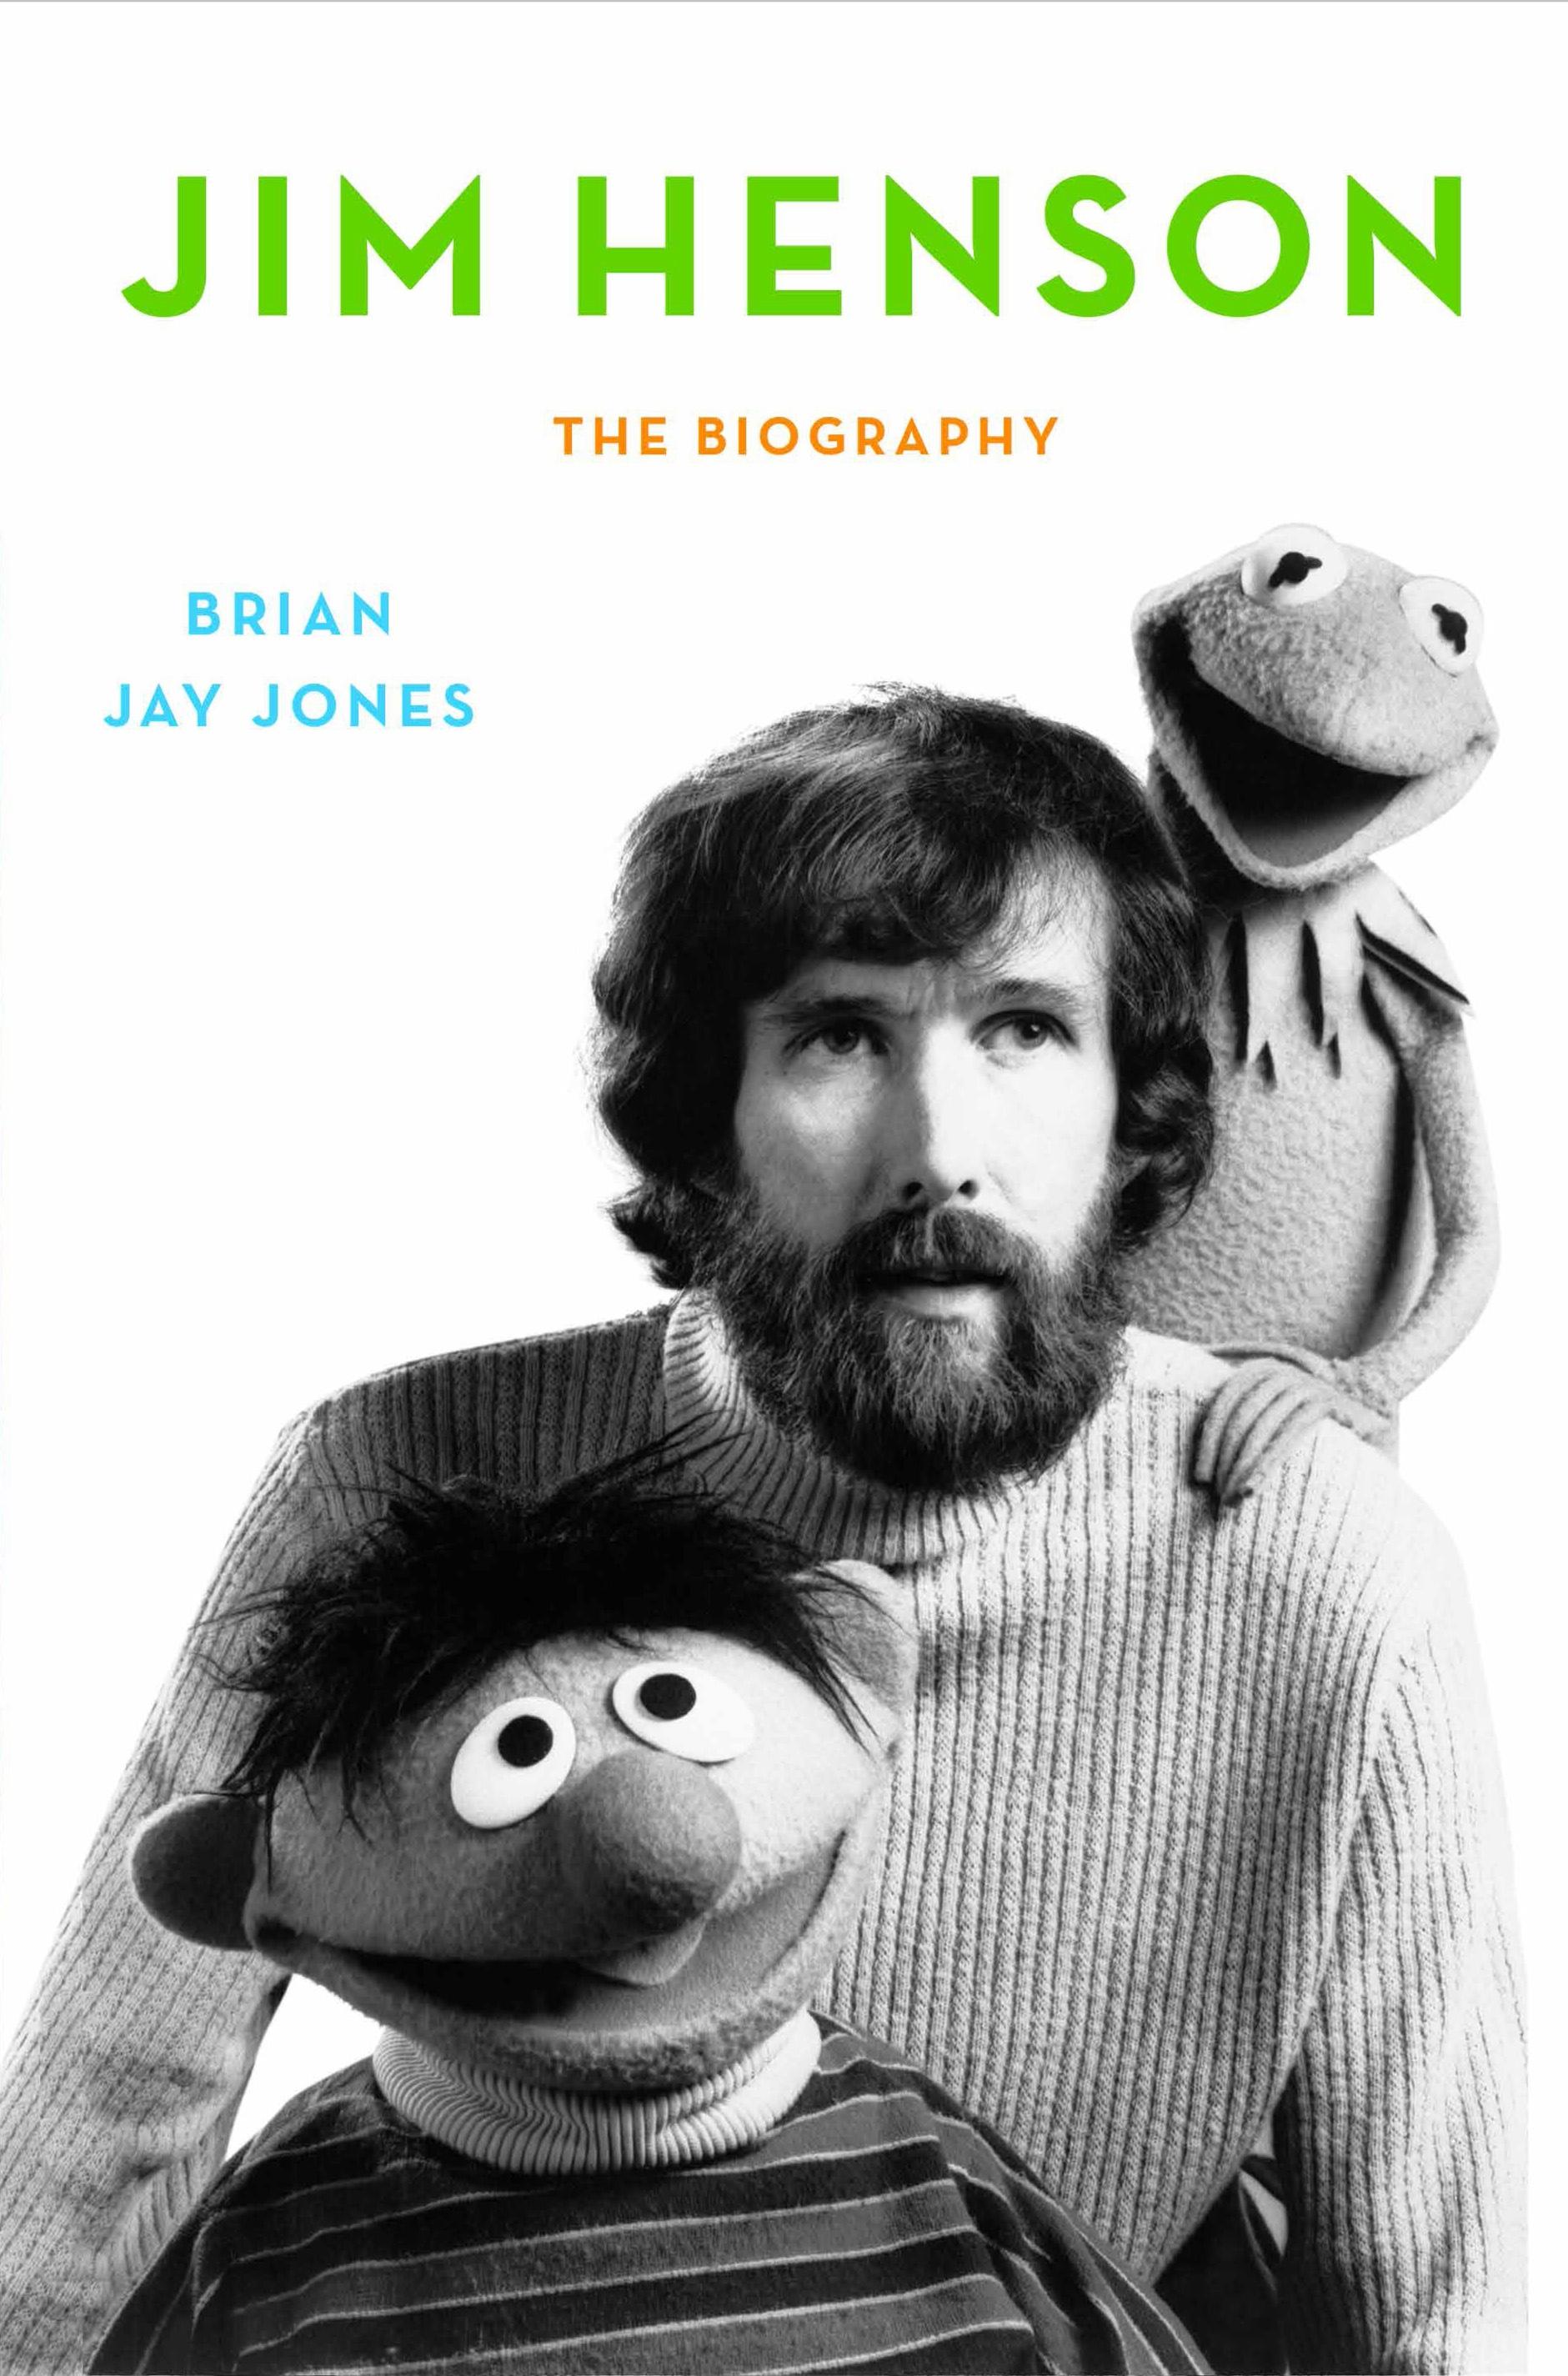 Jim Henson The Biography Muppet Wiki Fandom Powered